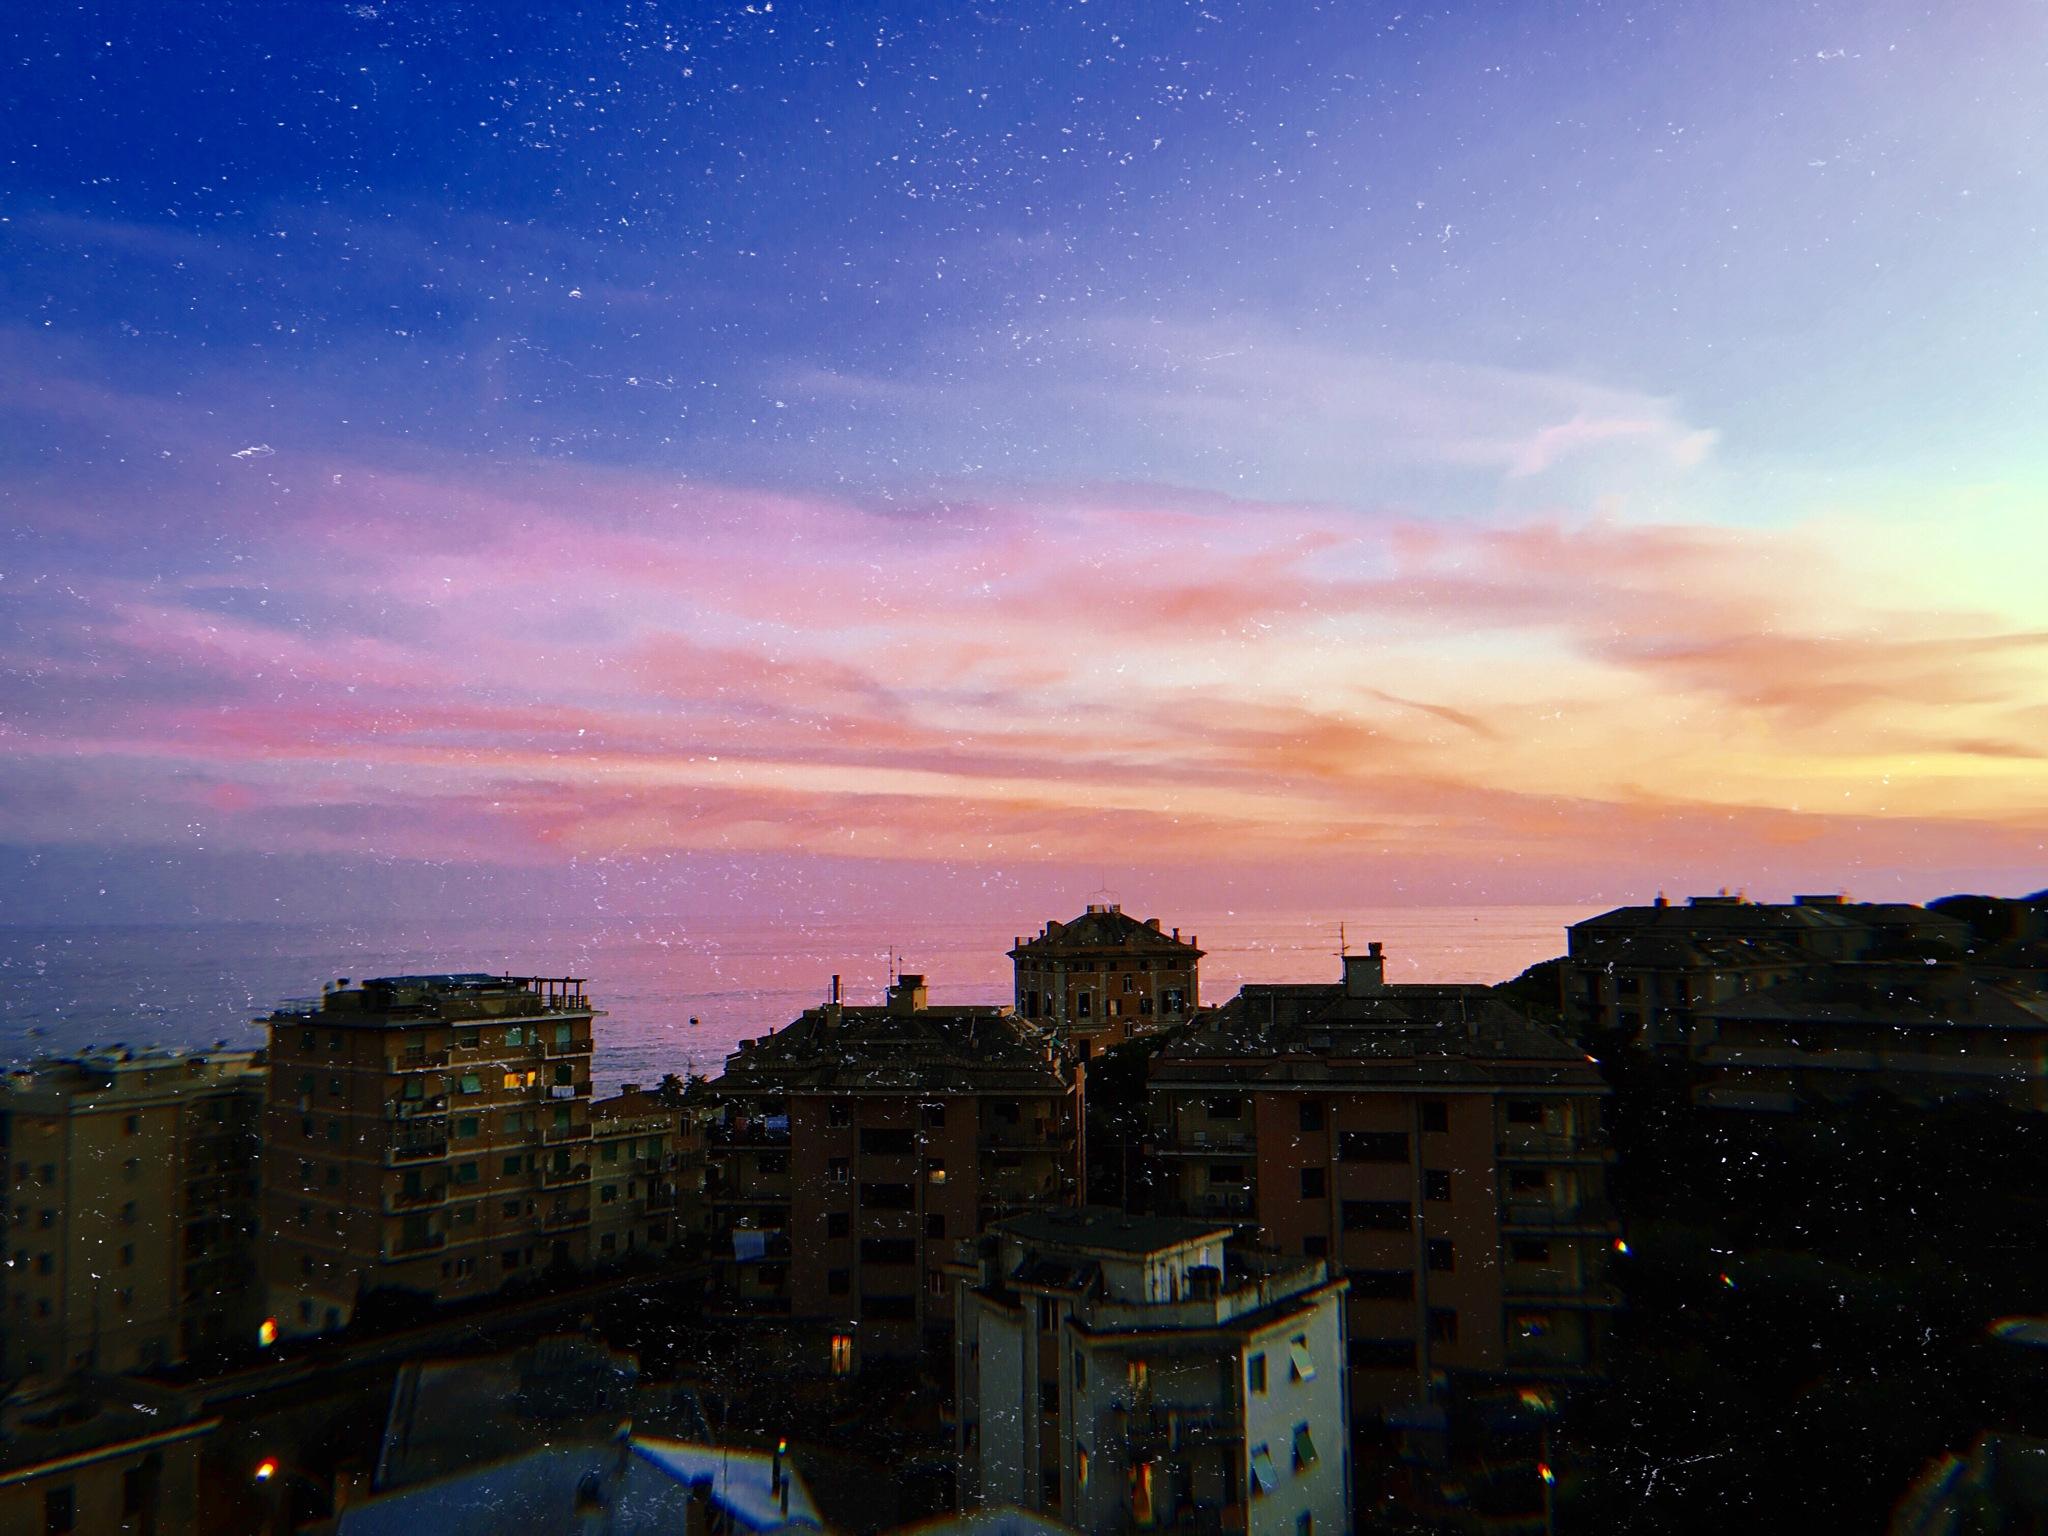 Sunset lover. by Annarosa Marraudino